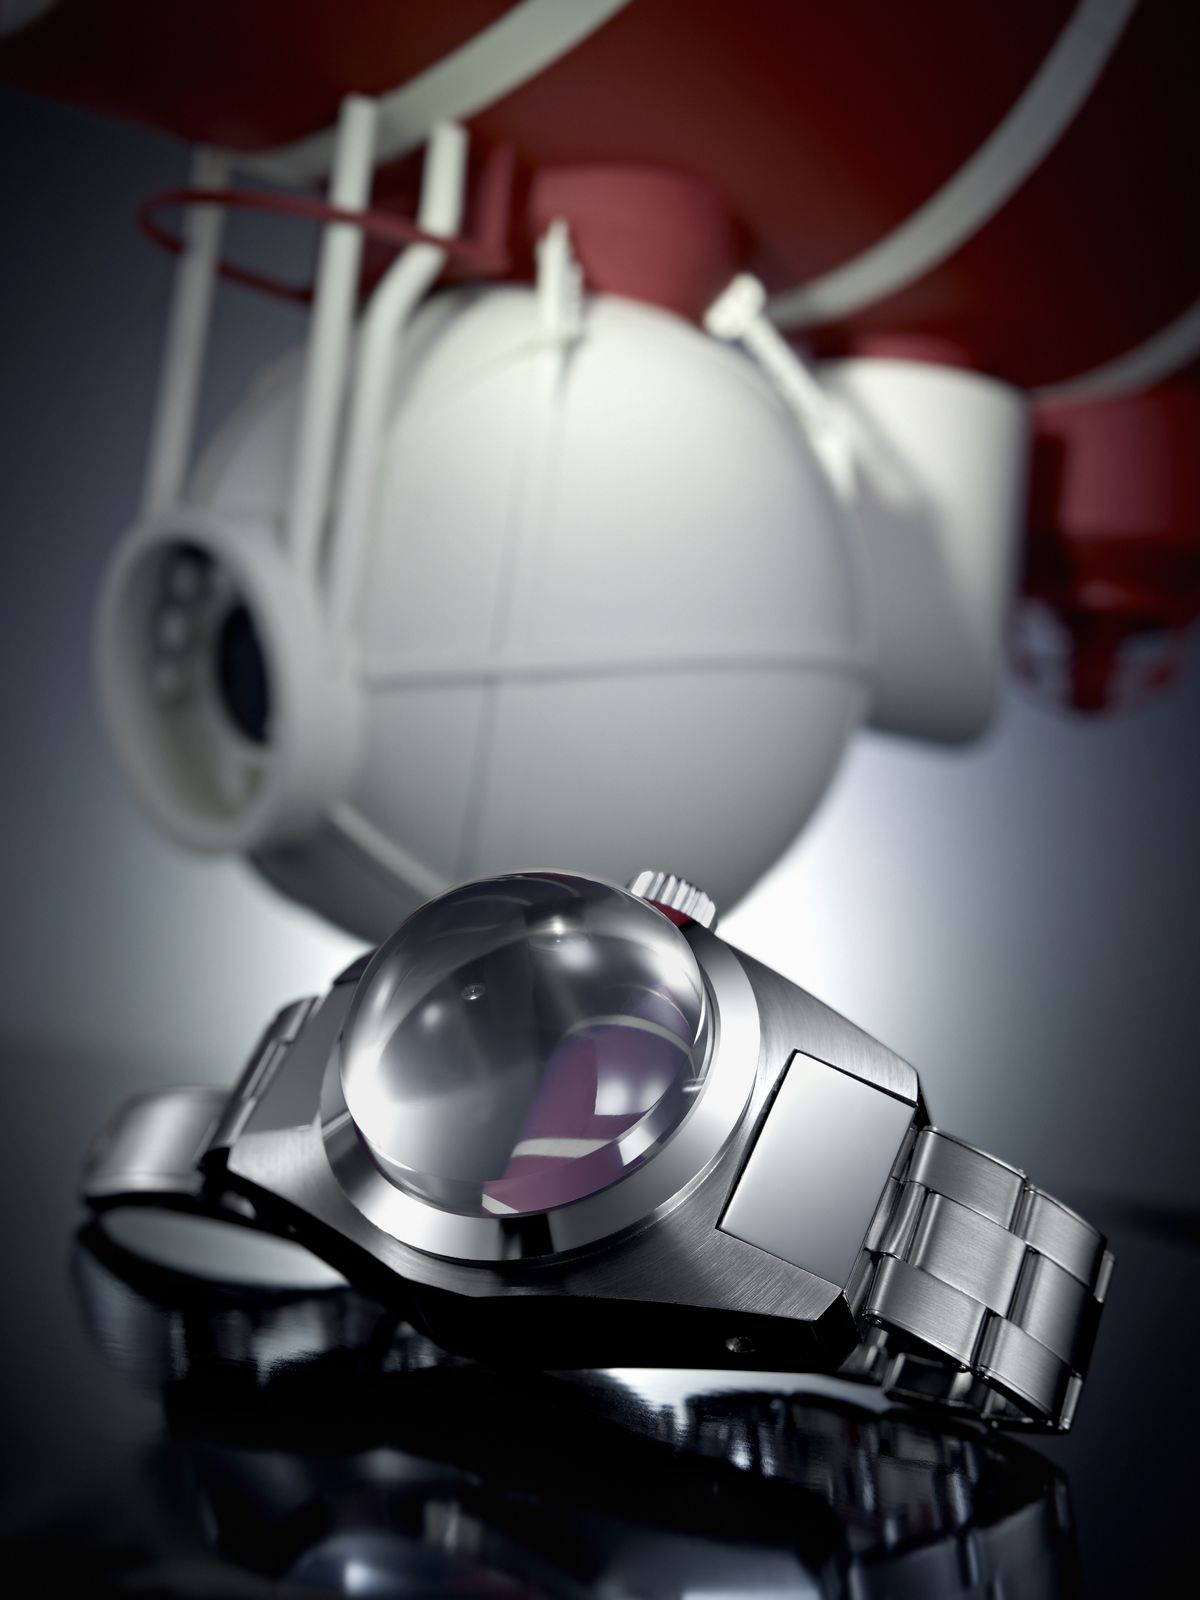 Rolex Deepsea Special (Photo: Rolex)